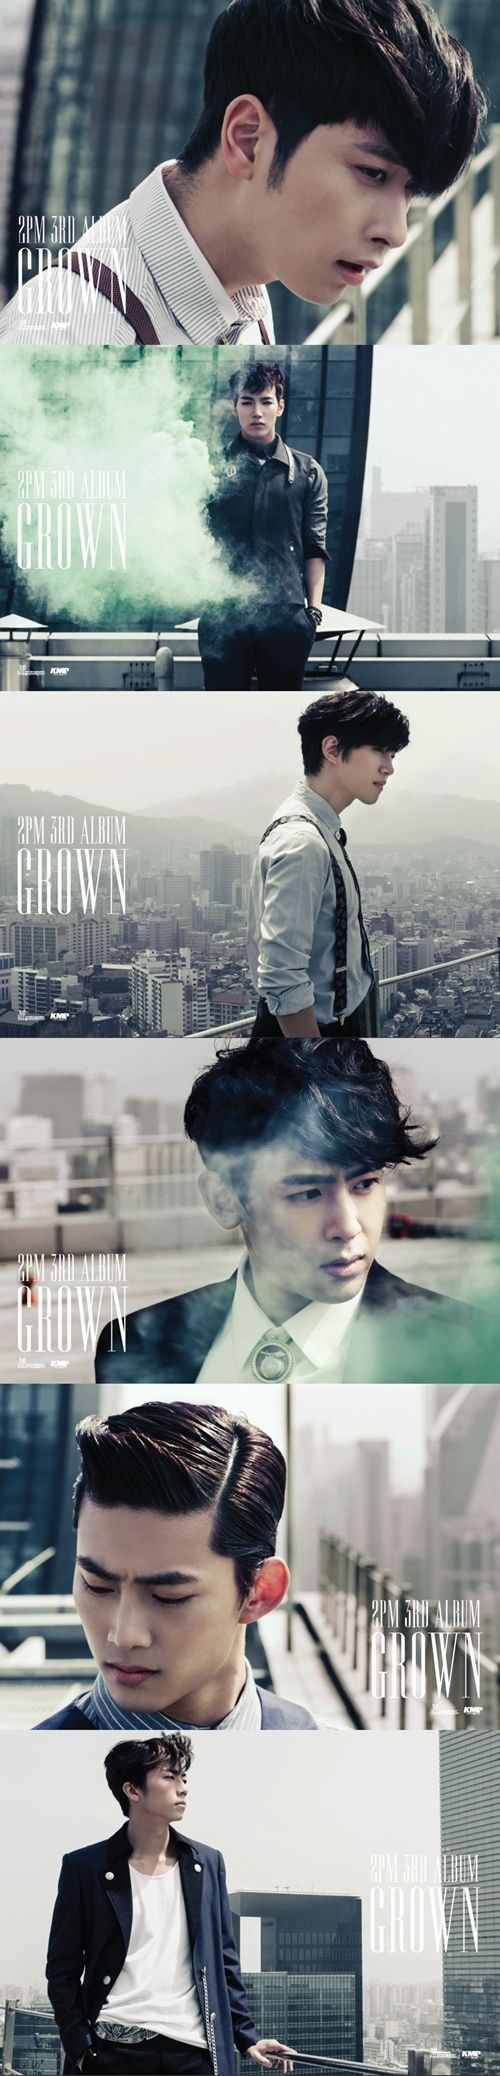 2PM to release 3rd album 'GROWN' in korea #2pm #jyp #grown